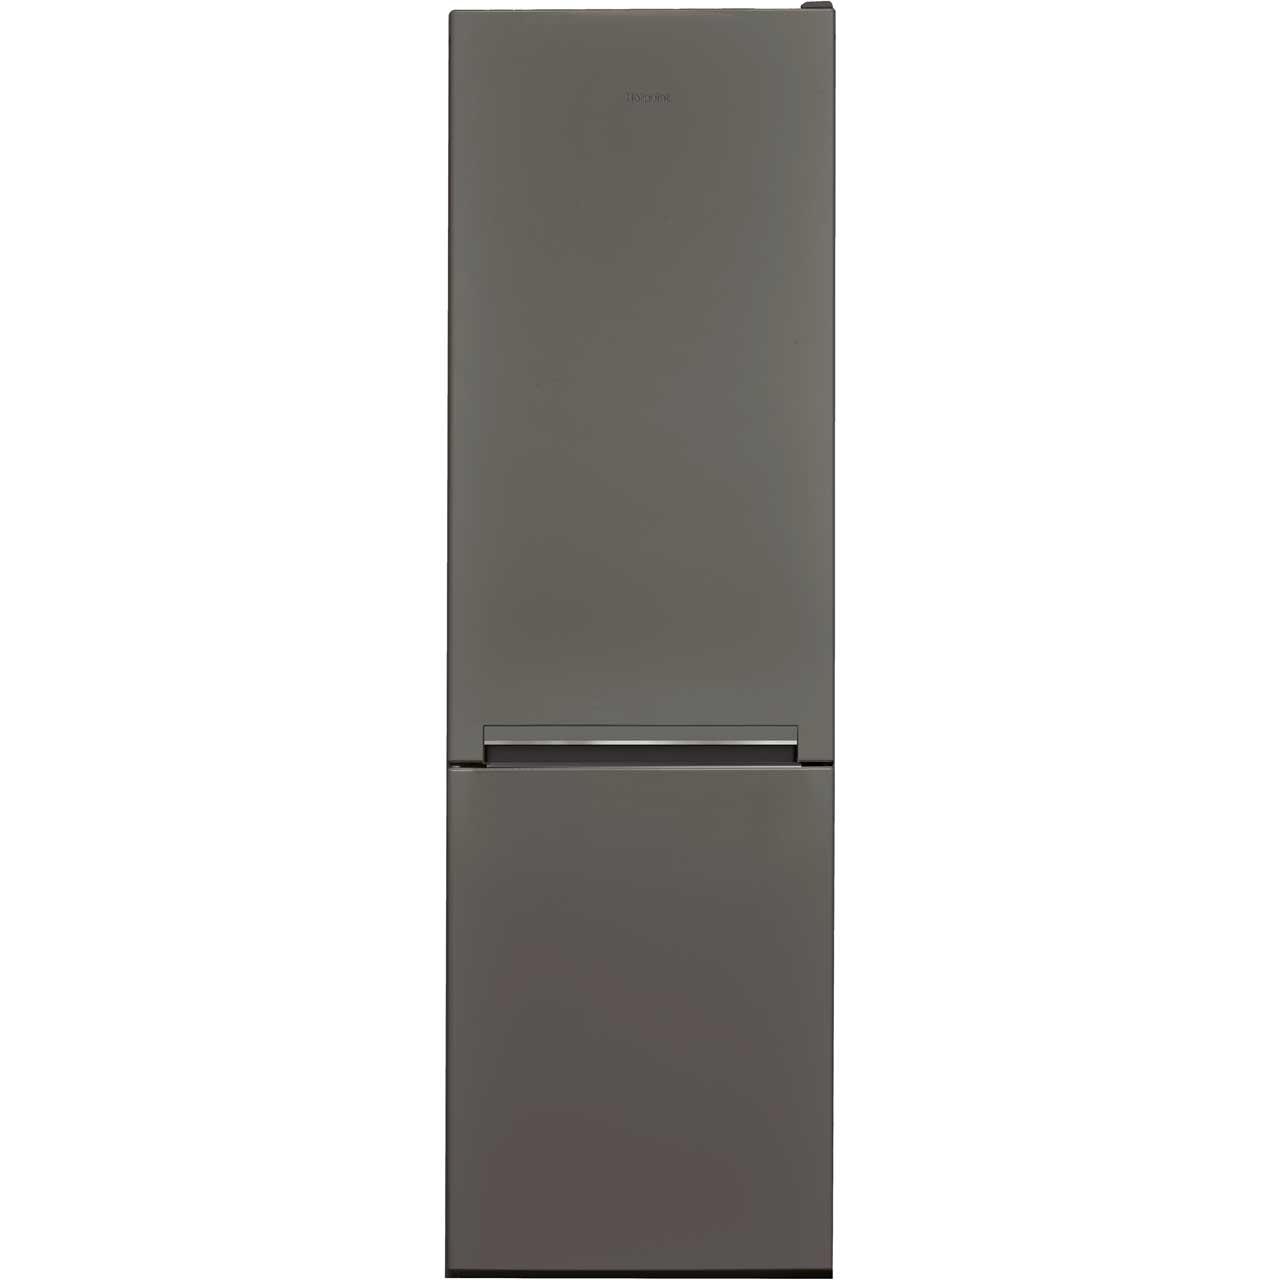 Hotpoint H8A1ESB Free Standing Fridge Freezer in Graphite